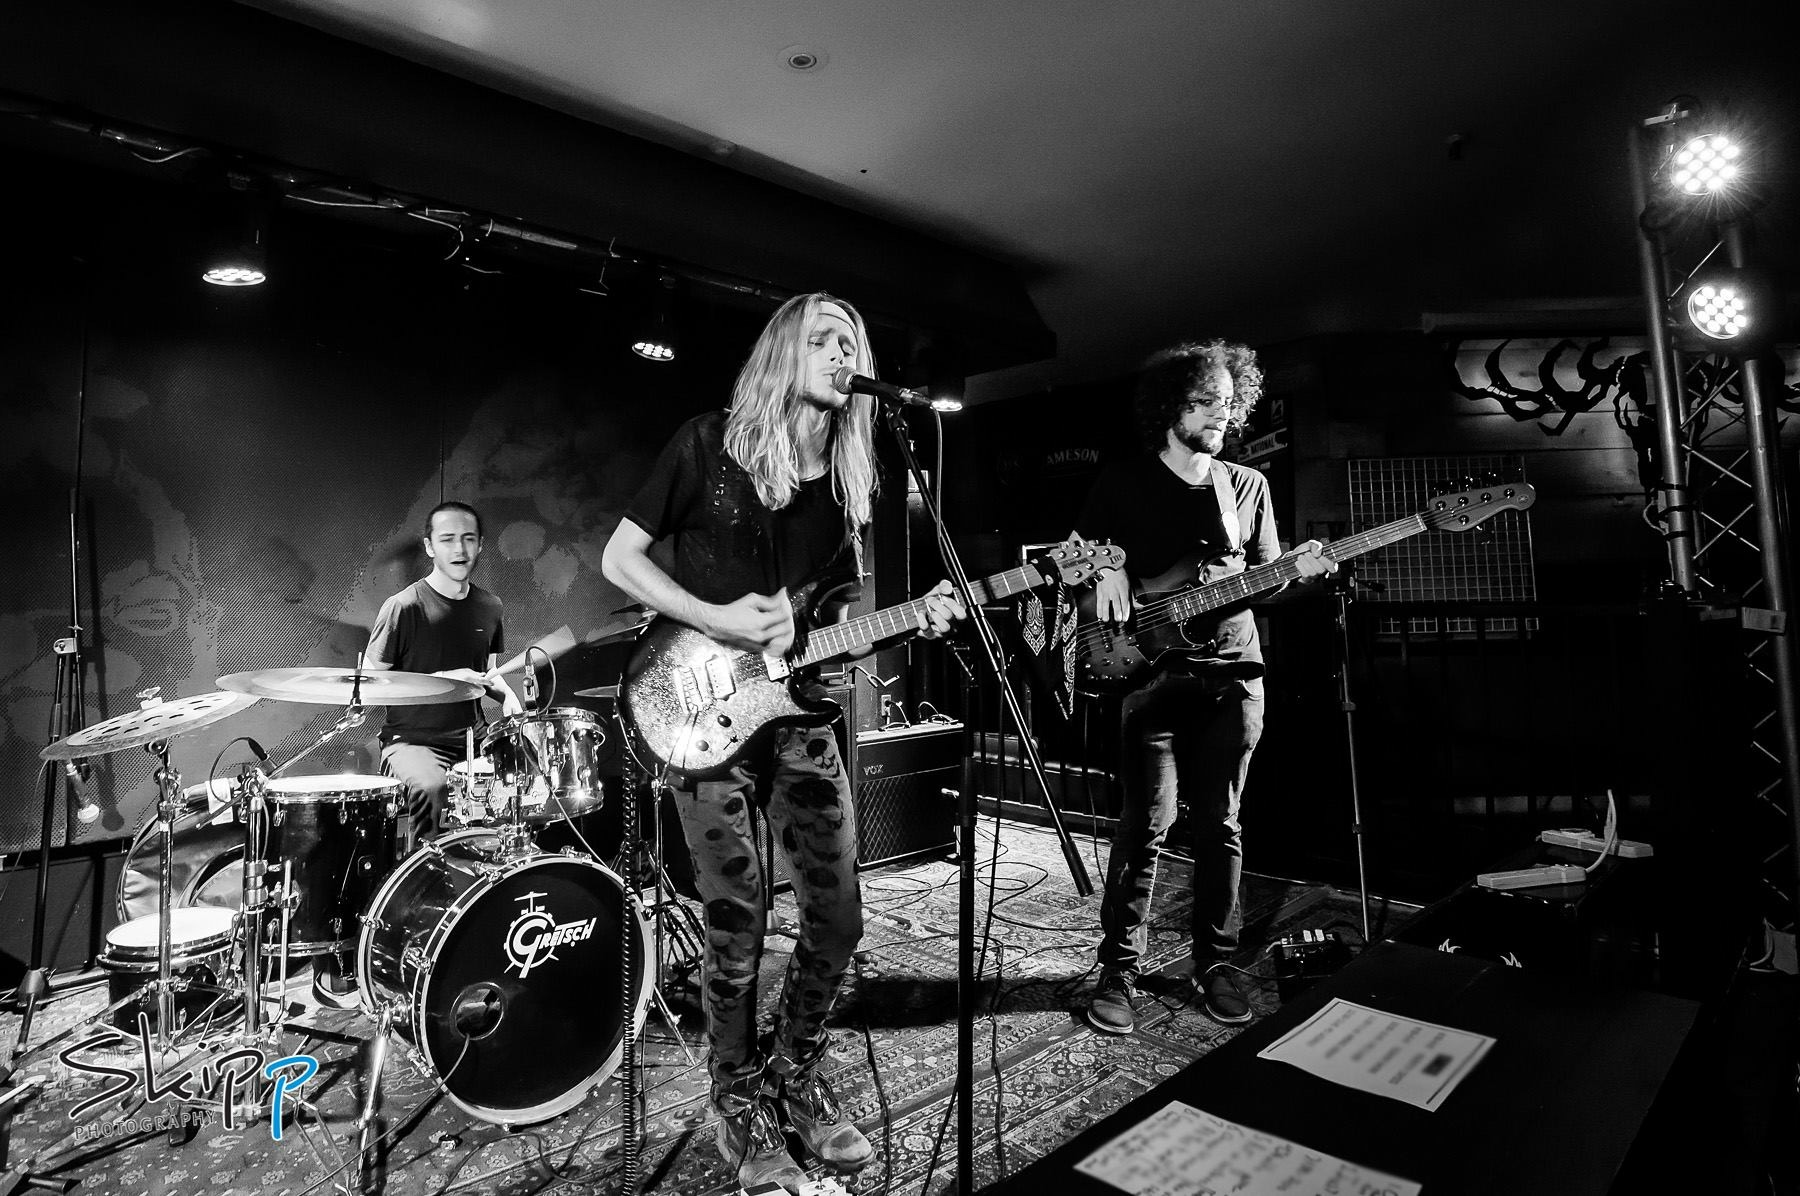 Lyric Dubee Band at Hideout Photo Credit: Gareth Skipp